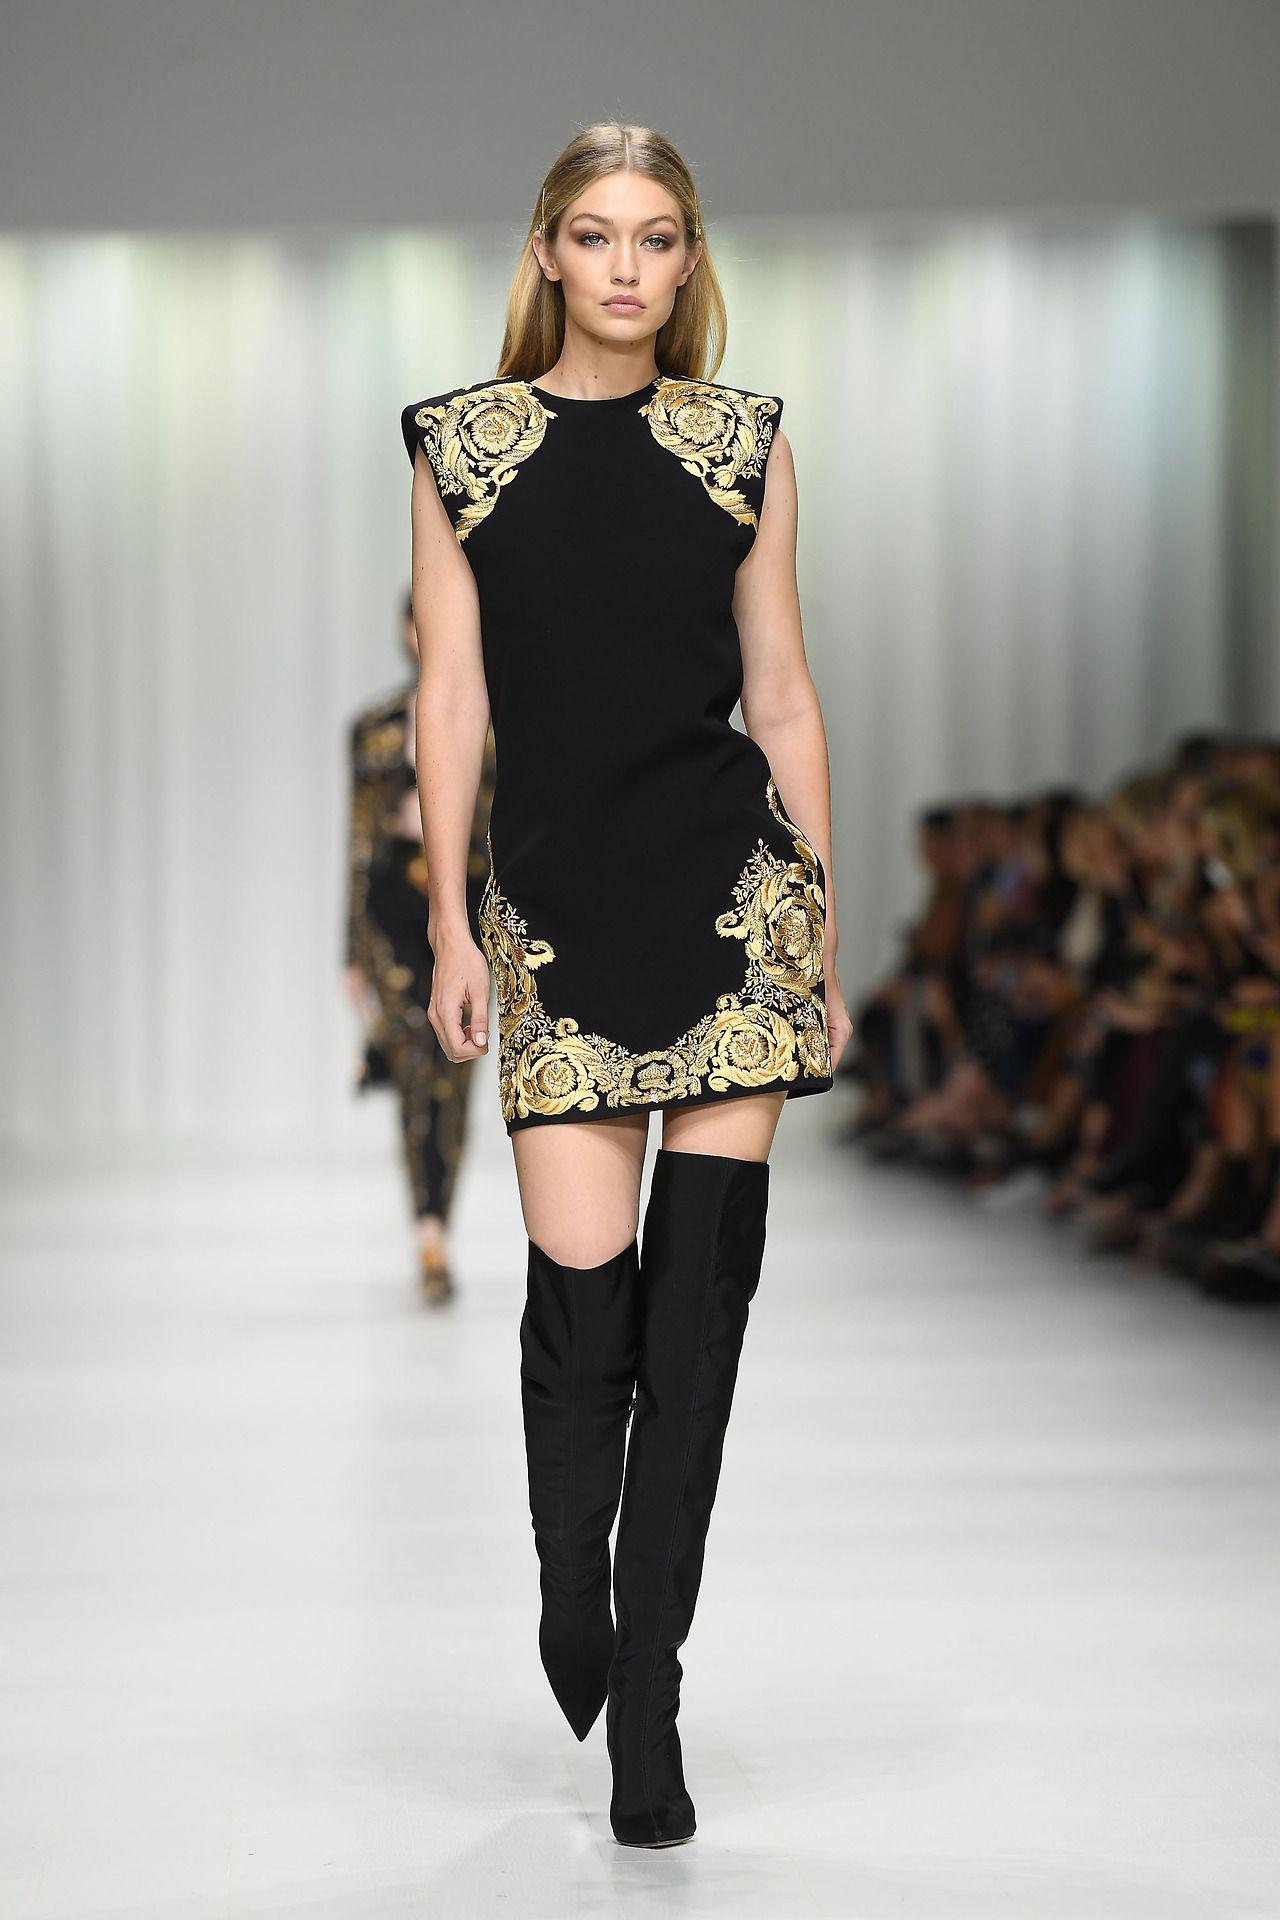 2f50cafaa Gigi Hadid walks the runway at the Versace show during Milan Fashion Week  Spring Summer 2018 on September 22